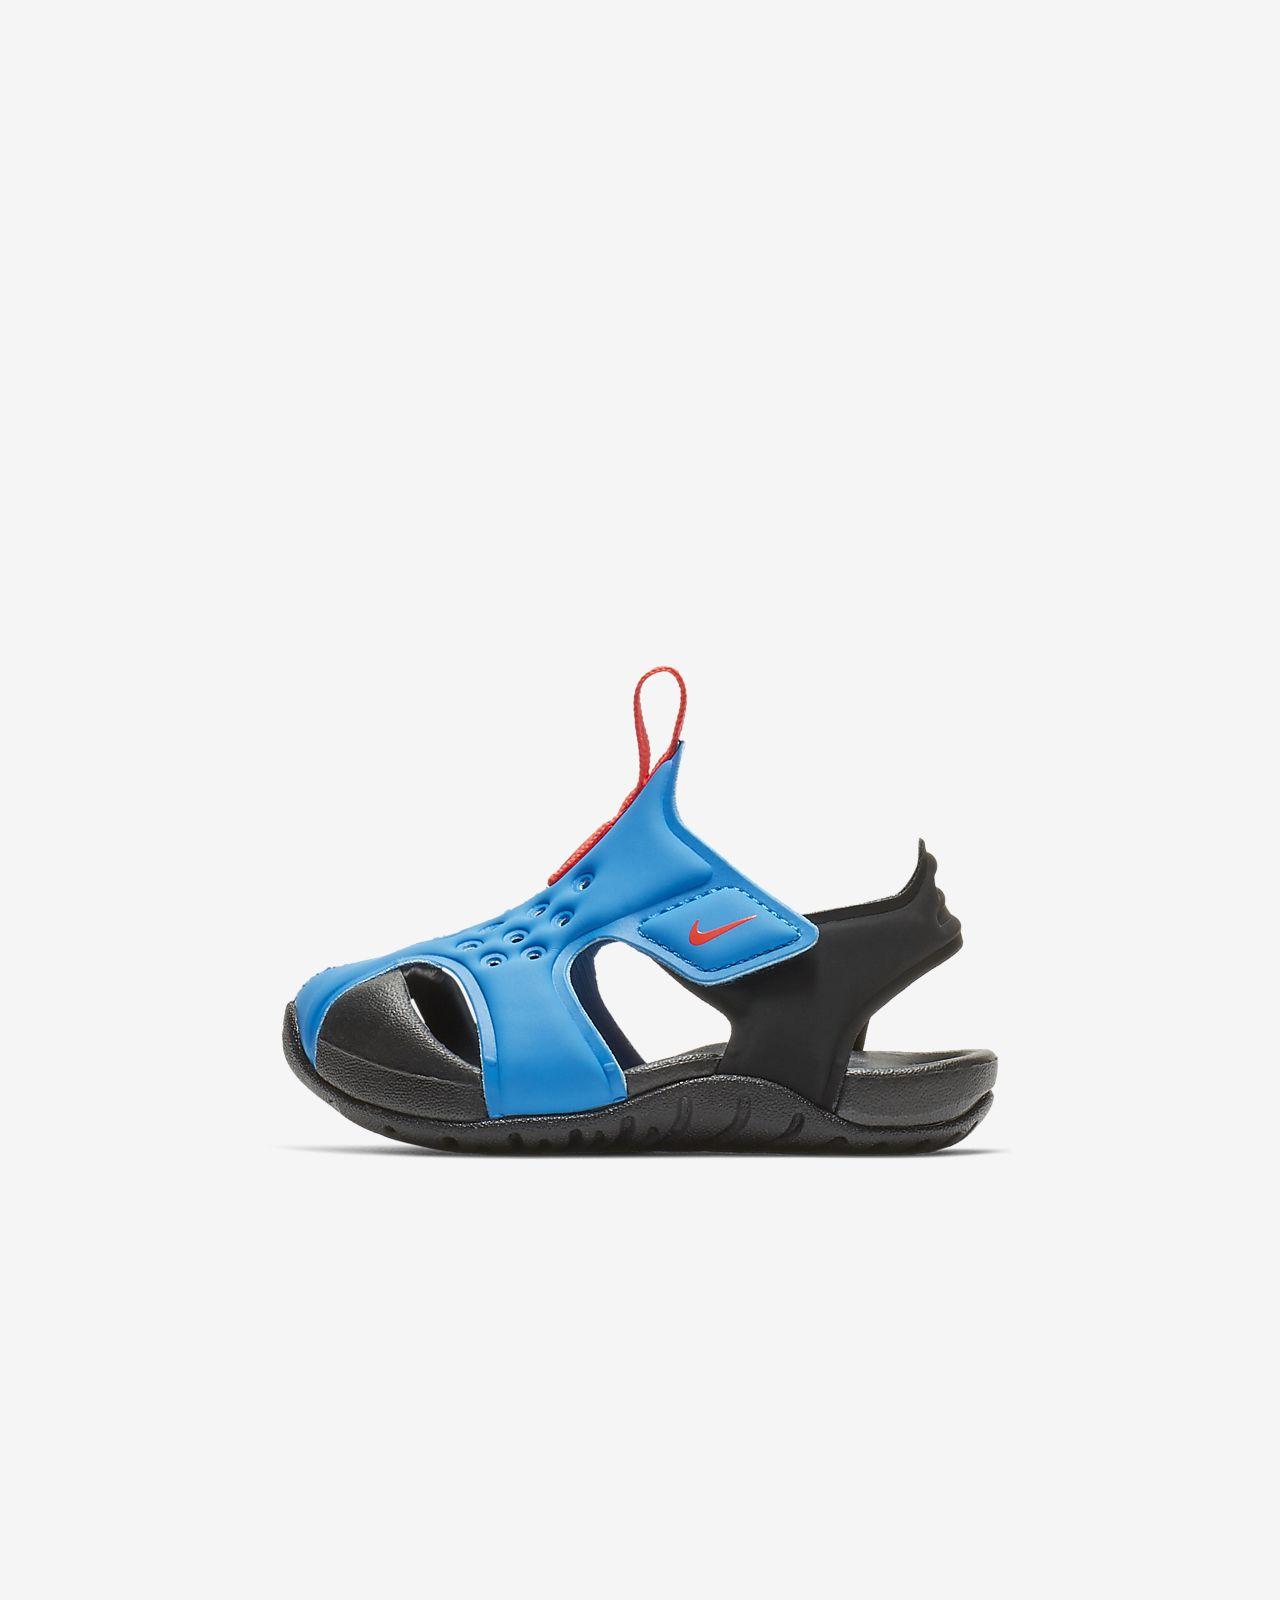 Nike Sunray Protect 2 Sandalias - Bebé e infantil